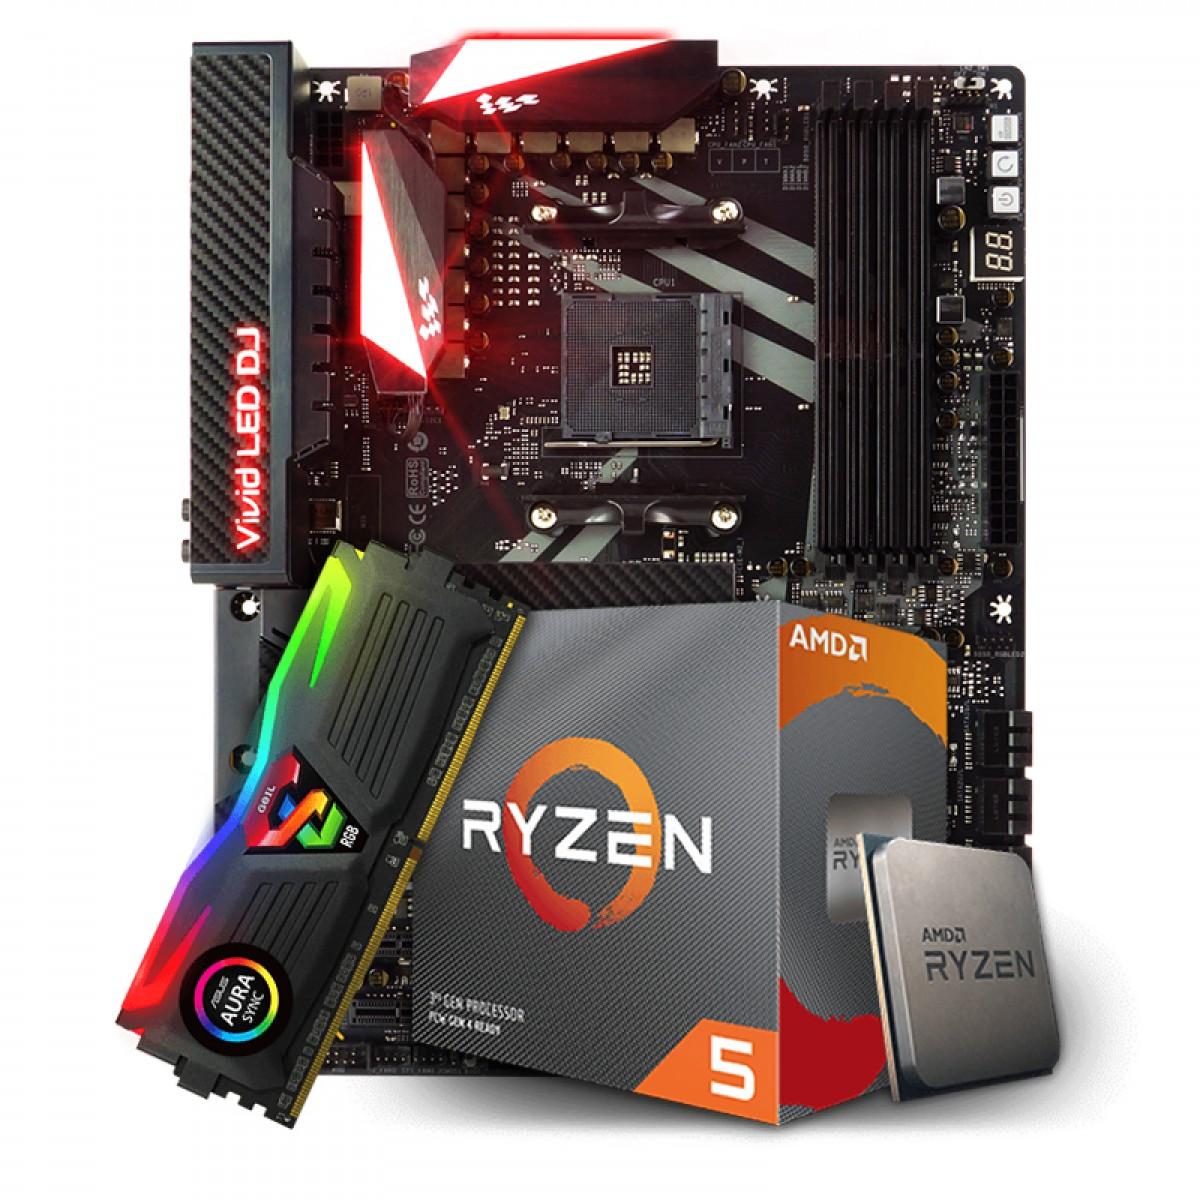 Kit Upgrade Placa Mãe Biostar Racing X470GT8 AMD AM4 + Processador AMD Ryzen 5 3600x 3.8ghz + Memória DDR4 8GB 3200MHz